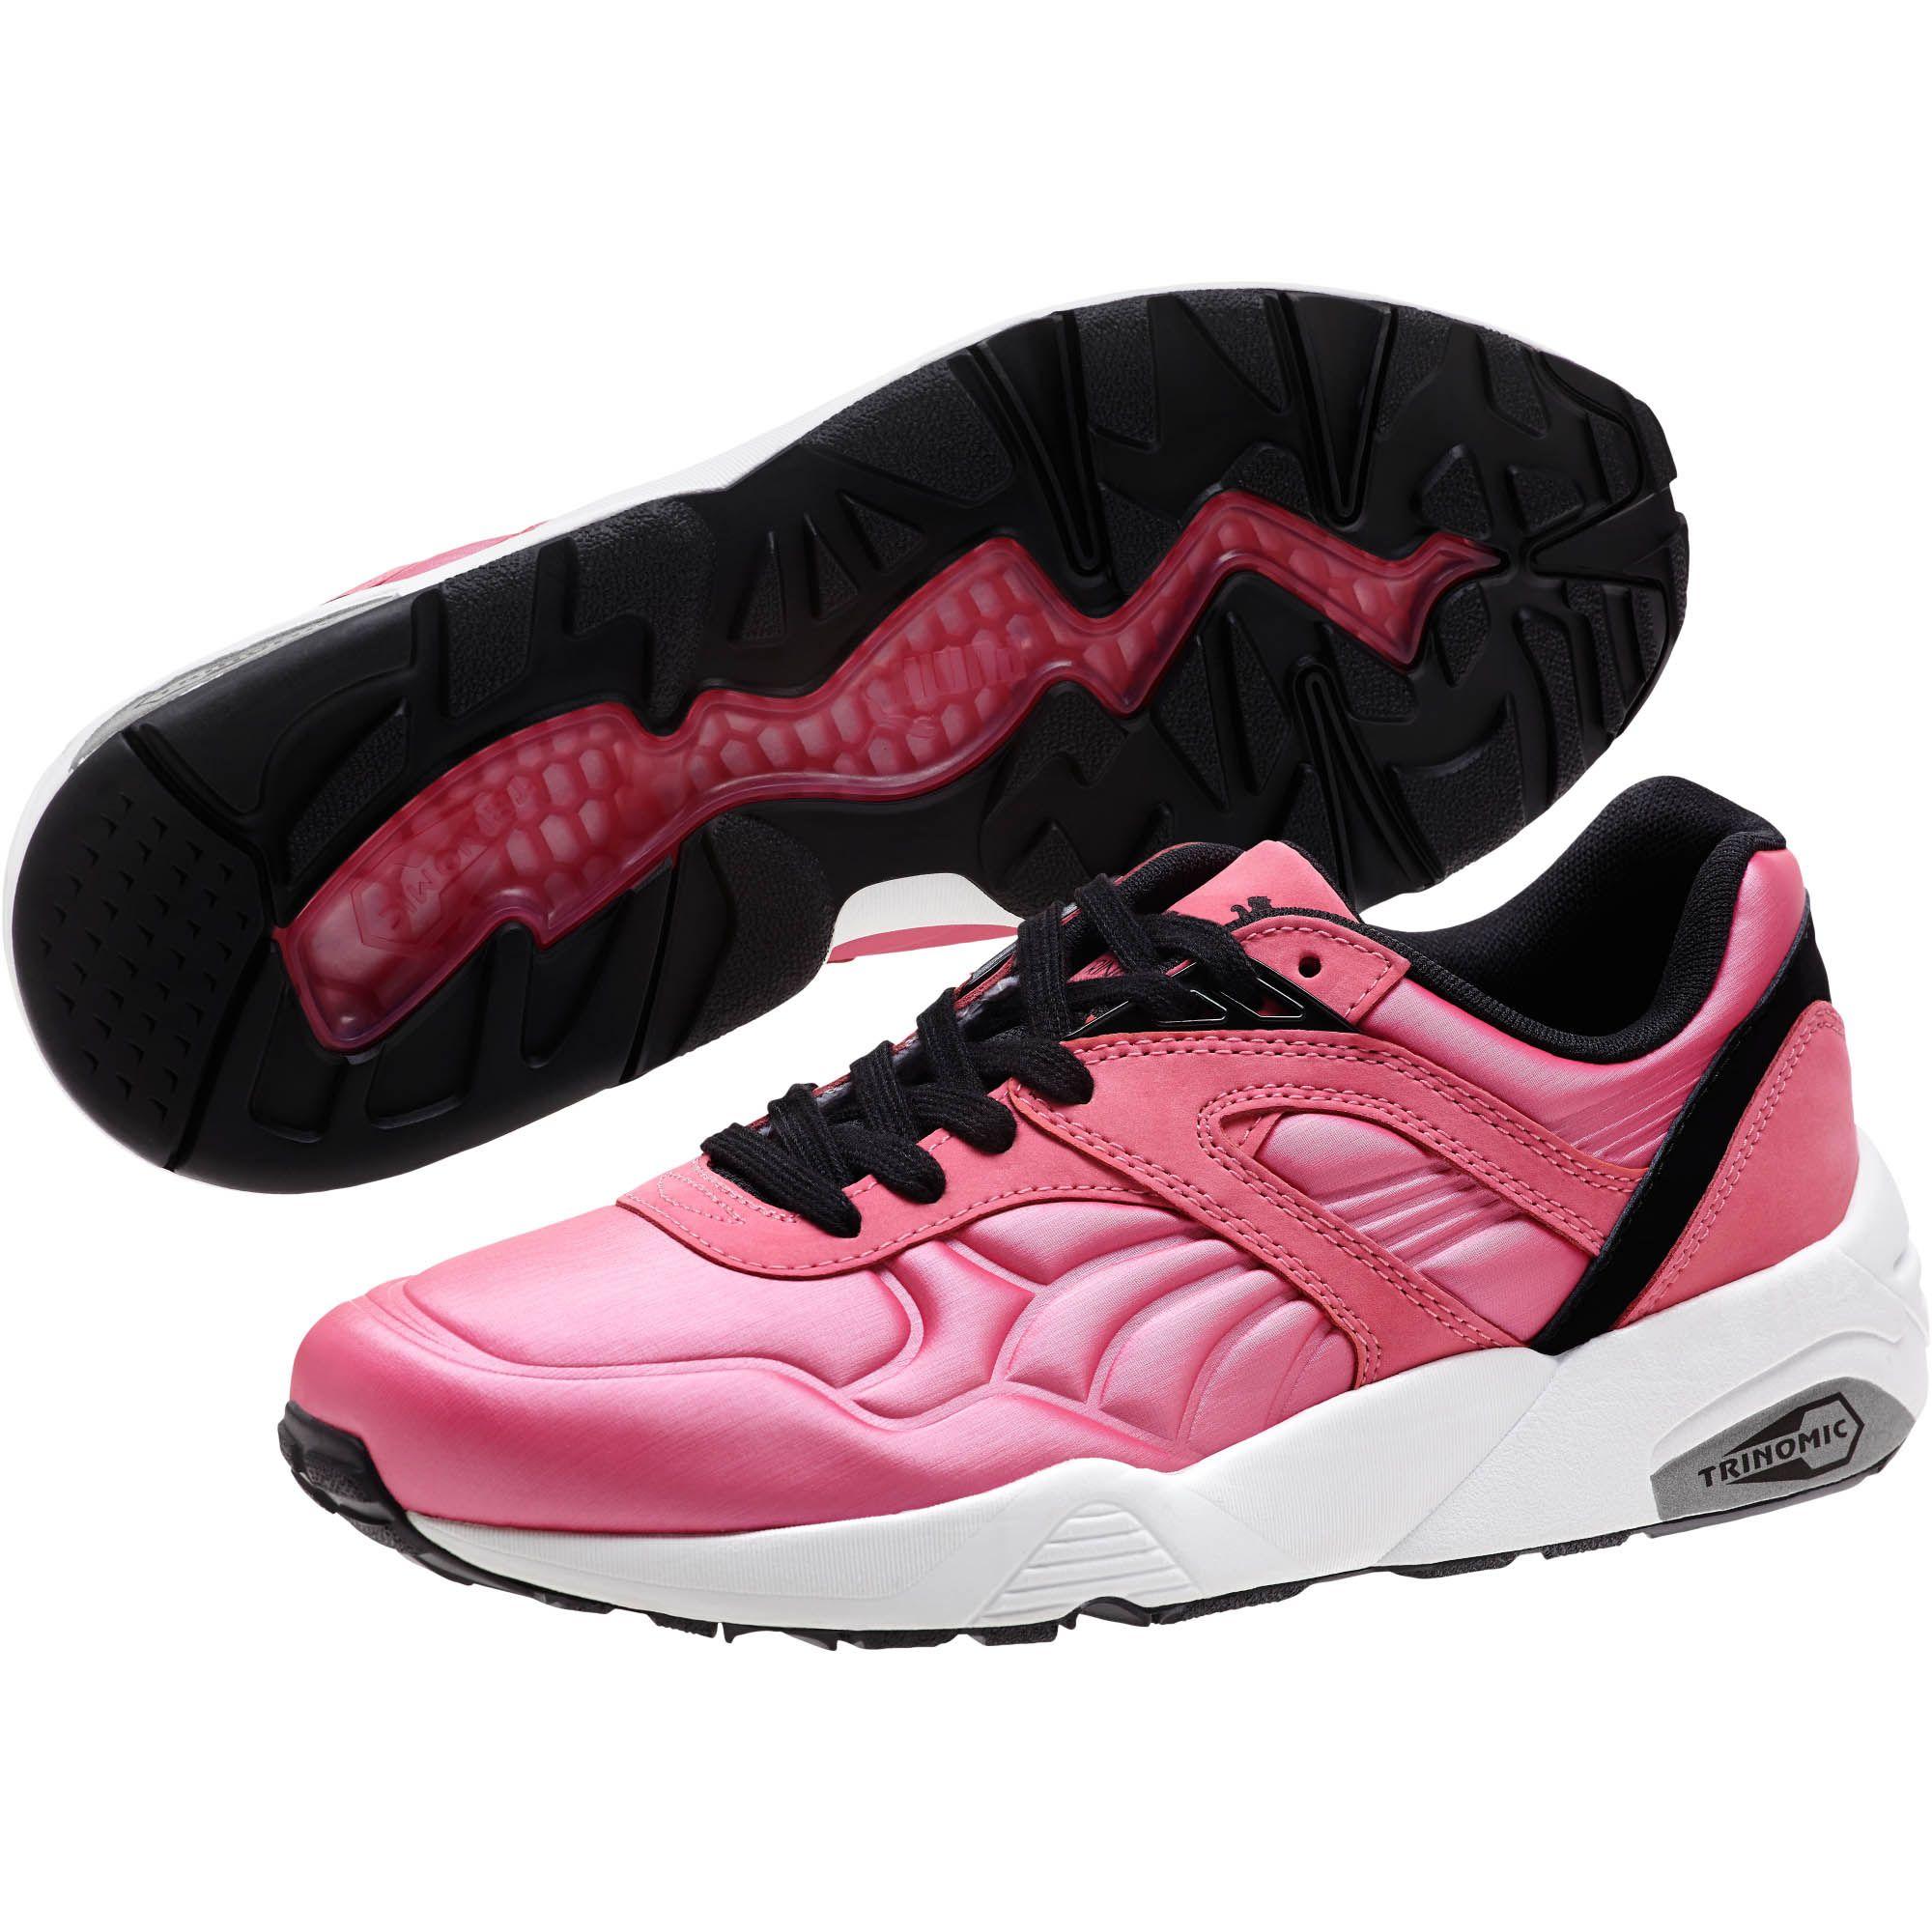 5e5adef88488 Lyst - PUMA R698 Matte   Shine Women s Sneakers in Black